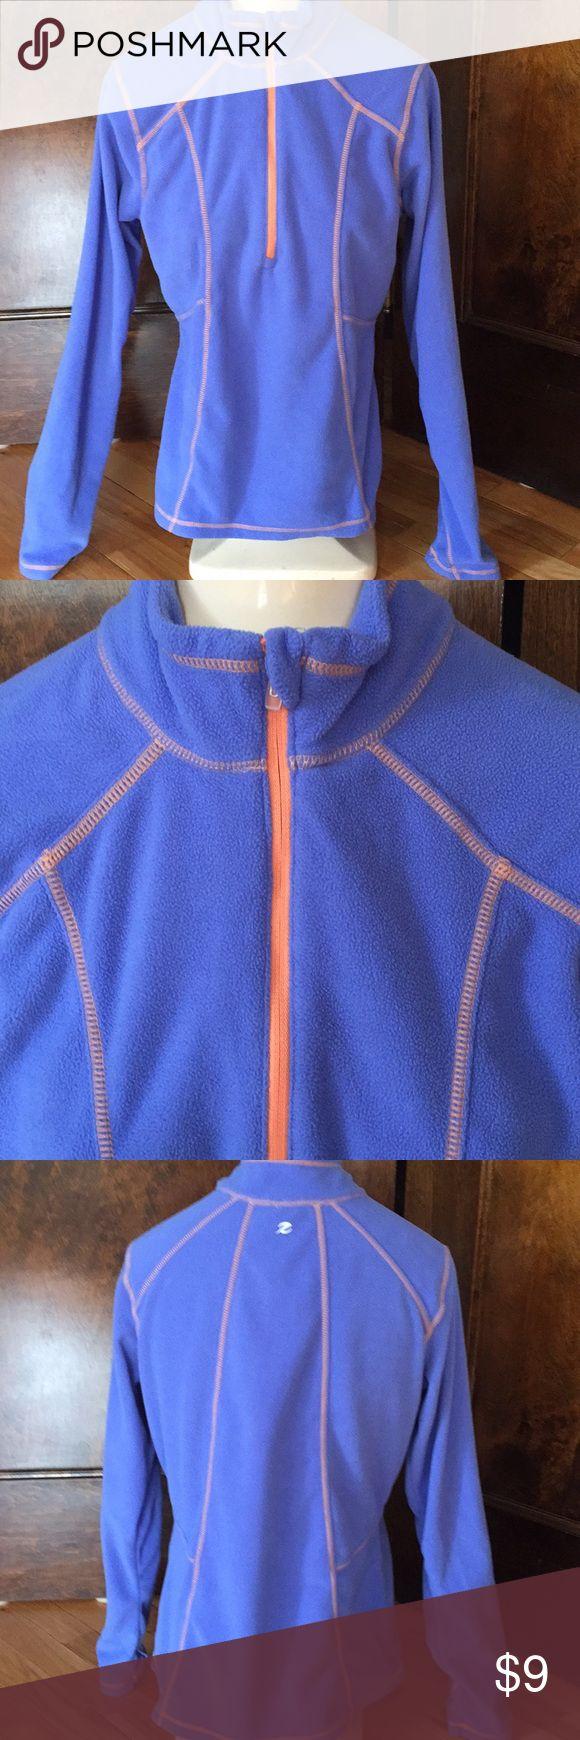 Cornflower blue/orange topstitch fleece, 1/4 zip M Coneflower blue long sleeve fleece top with orange top stitching on multiple panels and hemlines. Orange 1/4 zipper. Stand- up collar. Very soft and comfy. Size medium. Excellent condition. Nonsmoking home. Tops Sweatshirts & Hoodies